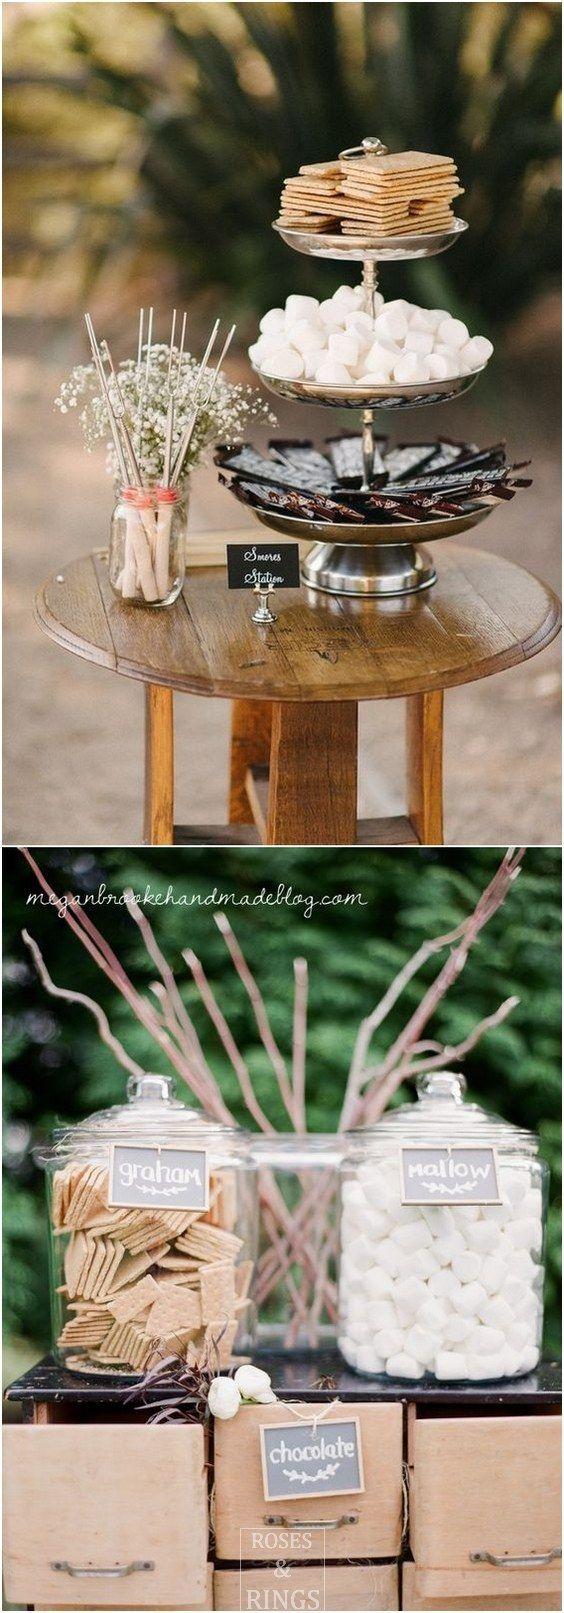 rustic wedding dessert ideas - rustic smores wedding bar ...